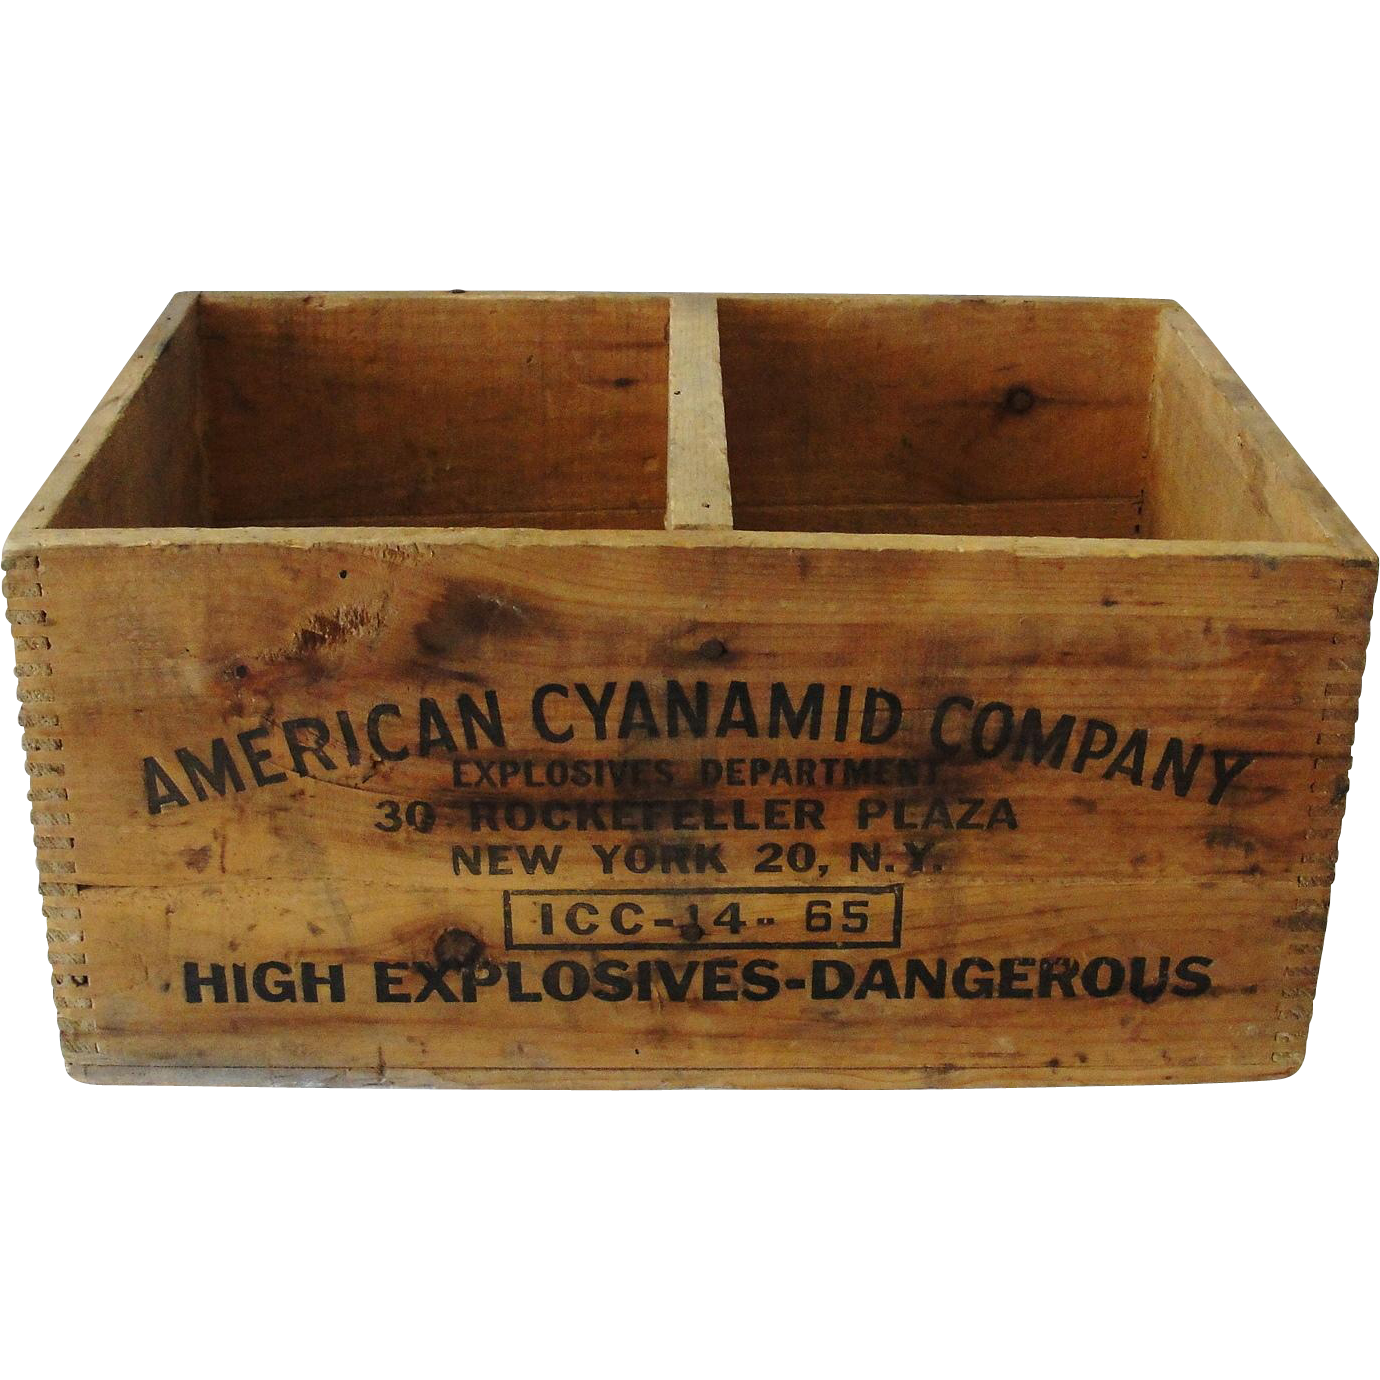 Vintage American Cyanamid Dynamite Wooden Crate